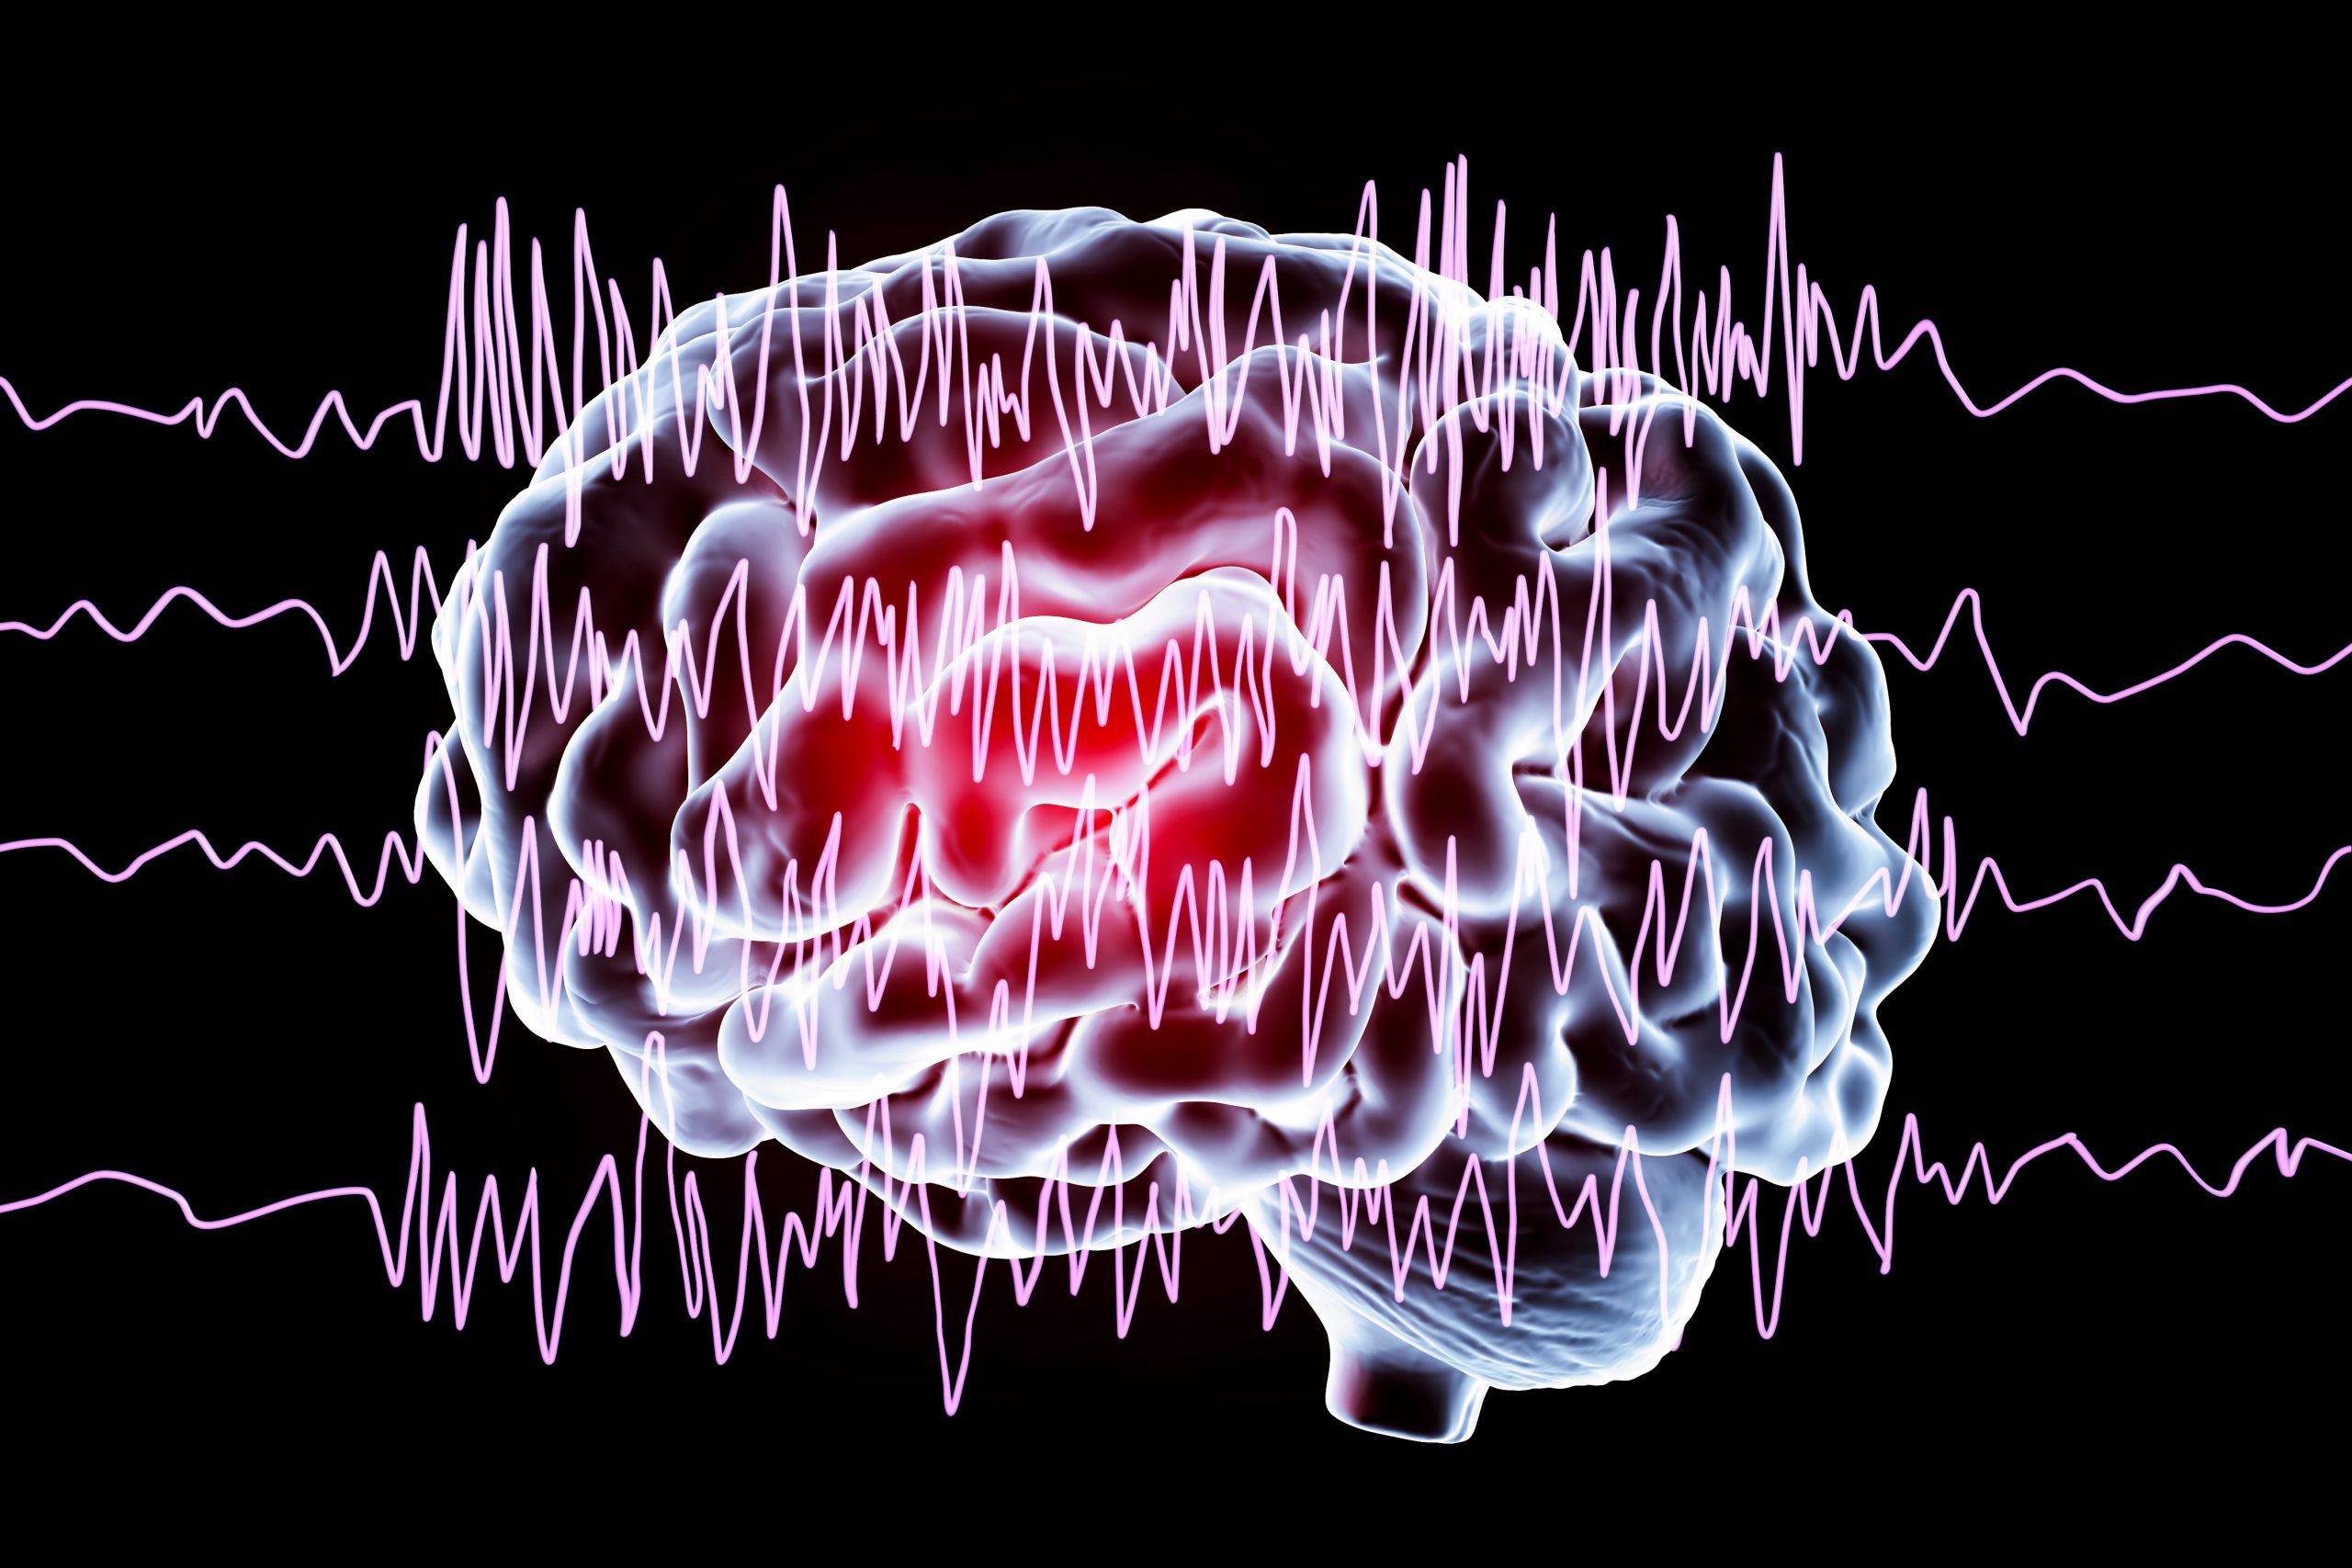 capture seizure by turning brainwaves into sound